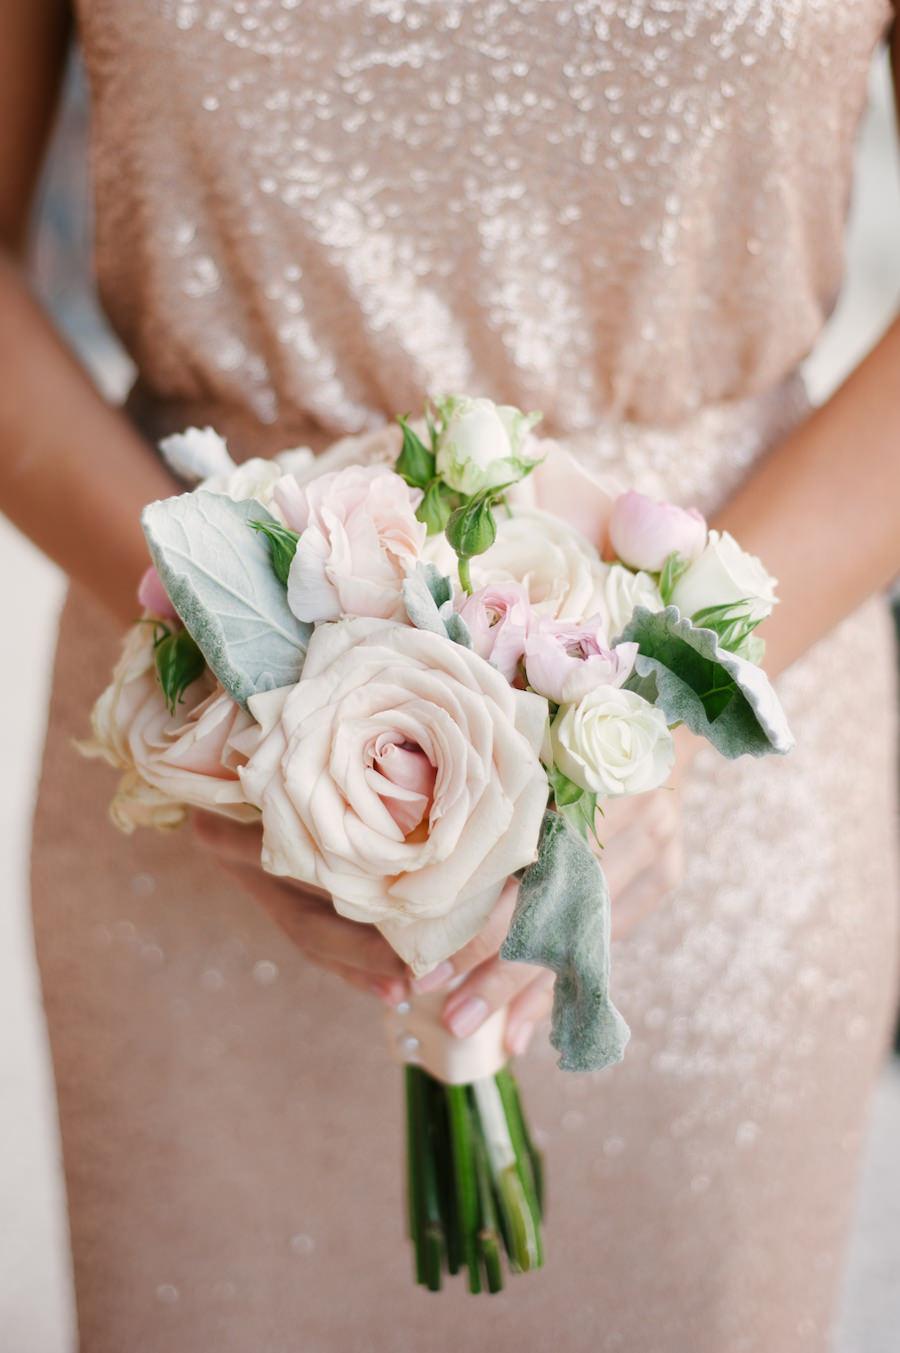 Champagne Gold Sequin Sorella Vita Bridesmaids Dress With Blush Pink